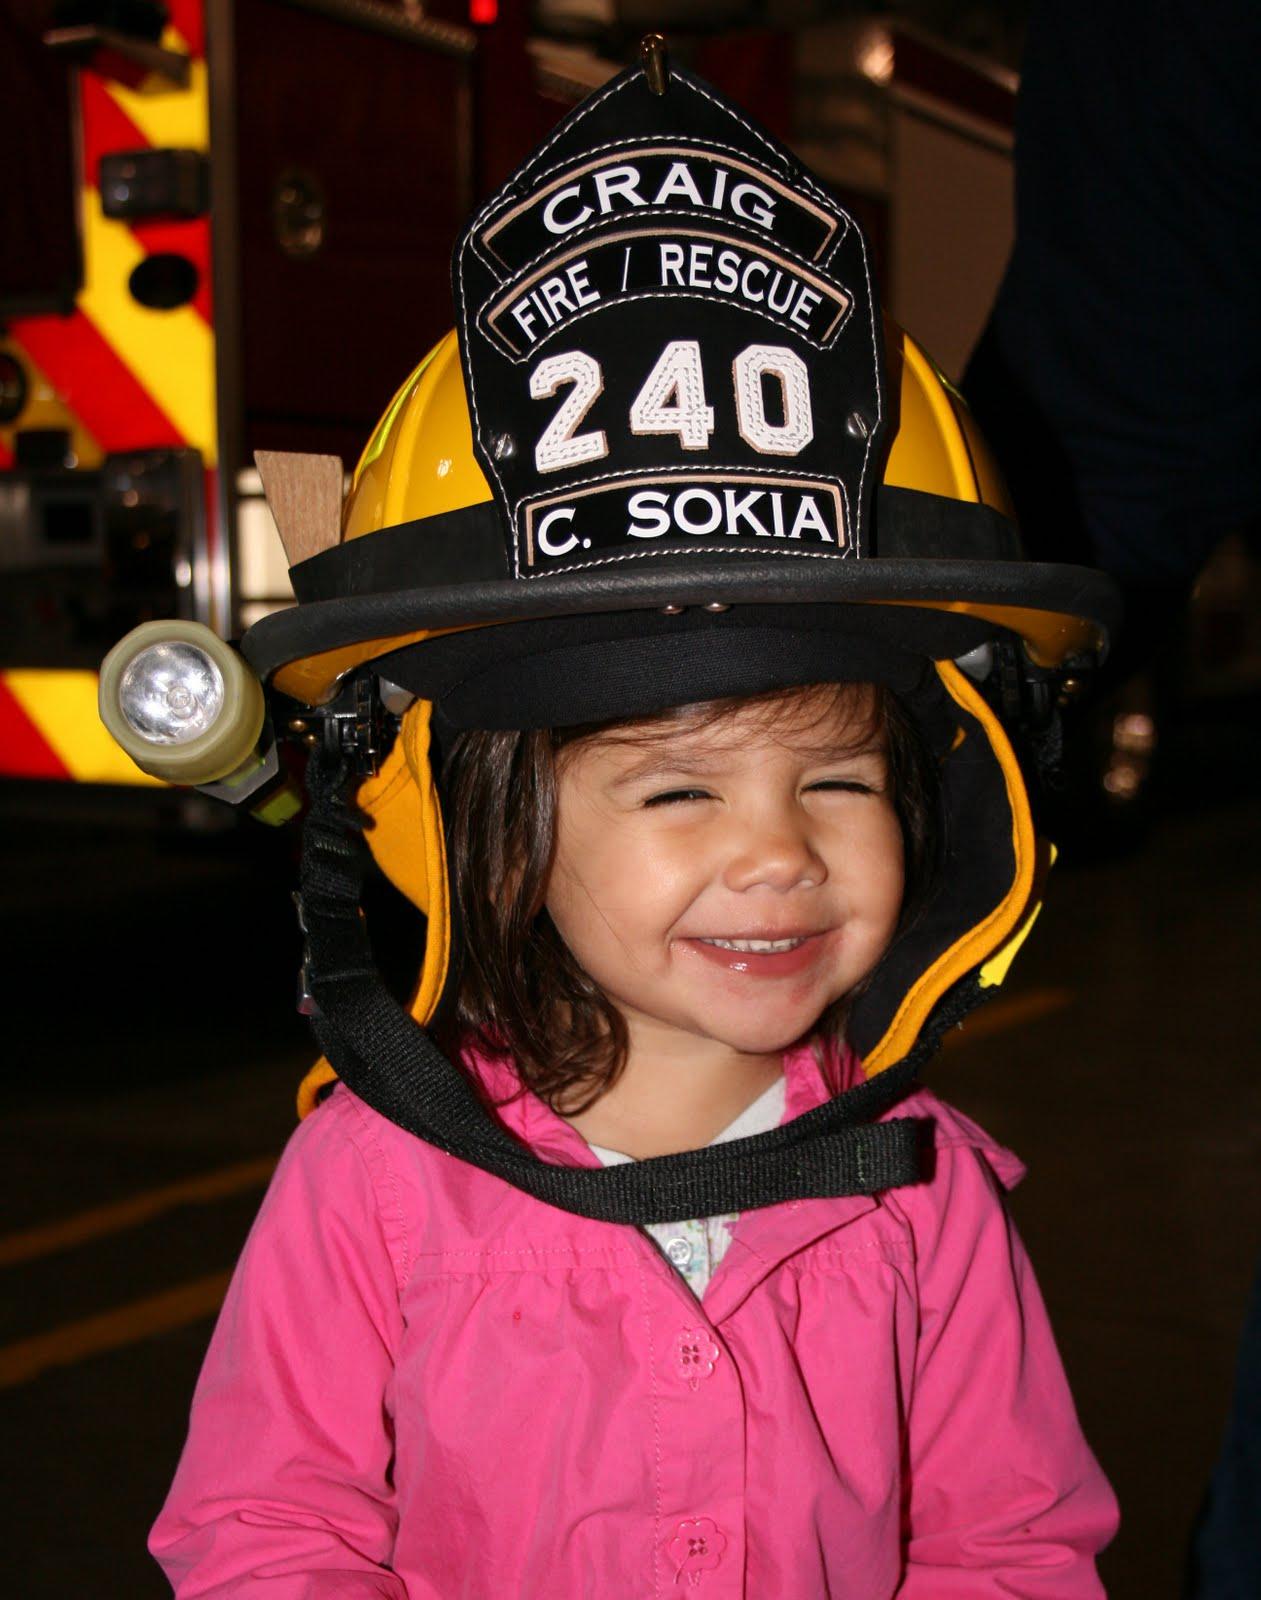 http://3.bp.blogspot.com/_Wa0Lhawt17Y/S71H3kvR0UI/AAAAAAAABJY/FJ1q3yv0Gts/s1600/Marley+the+Firefighter.JPG